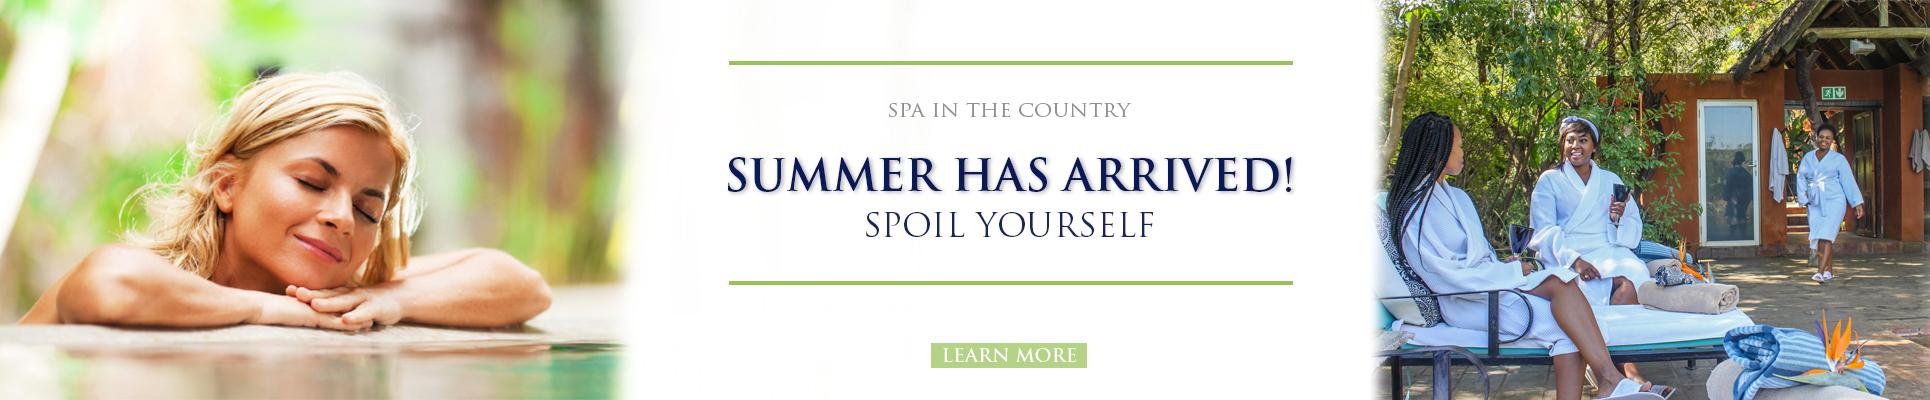 Spa Summer Special 2018